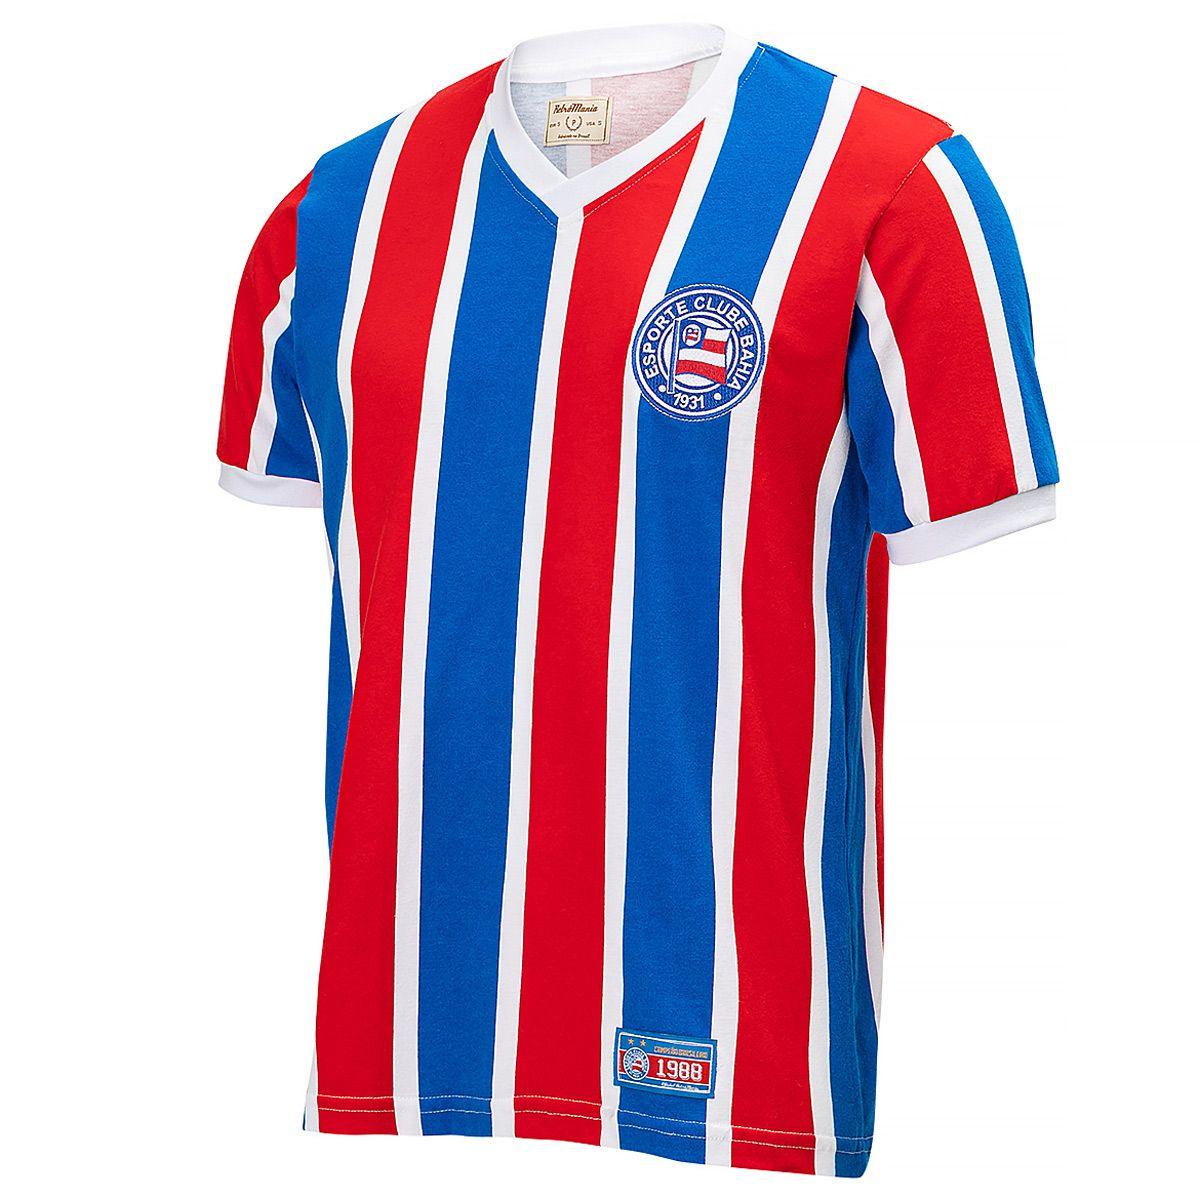 Camisa Bahia Retrô 1988 Masculina